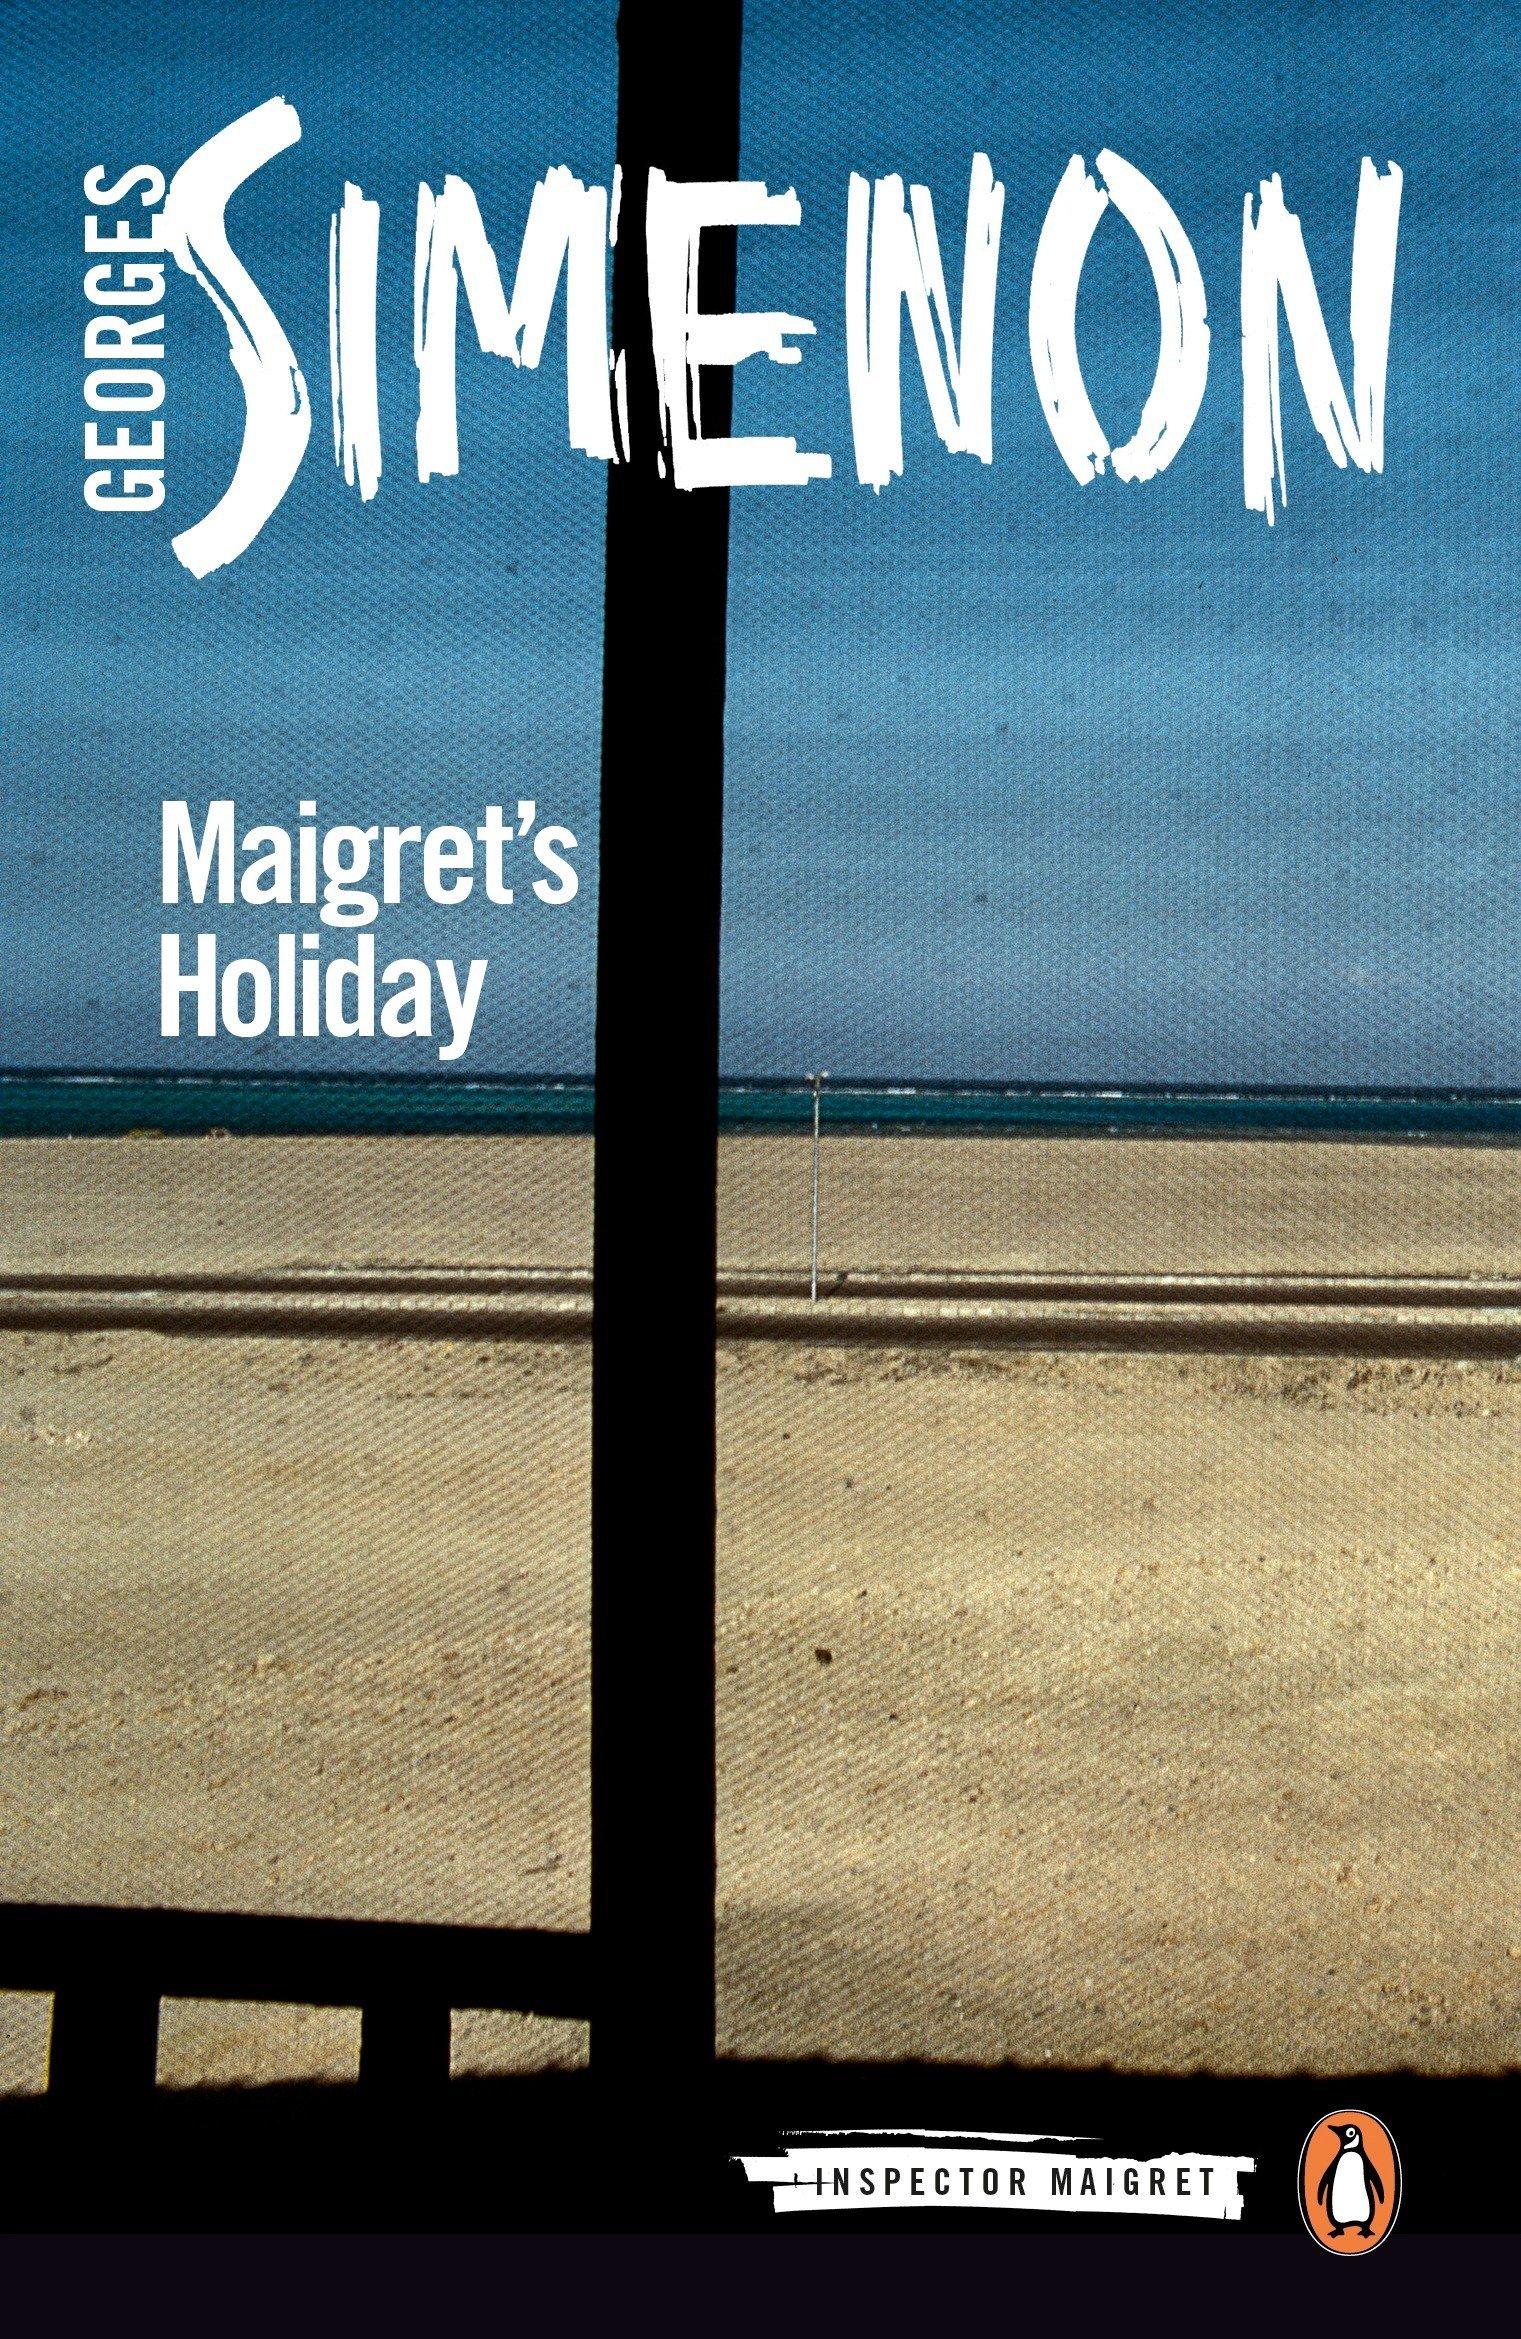 Amazon.com: Maigret\'s Holiday (Inspector Maigret) (9780141980744 ...